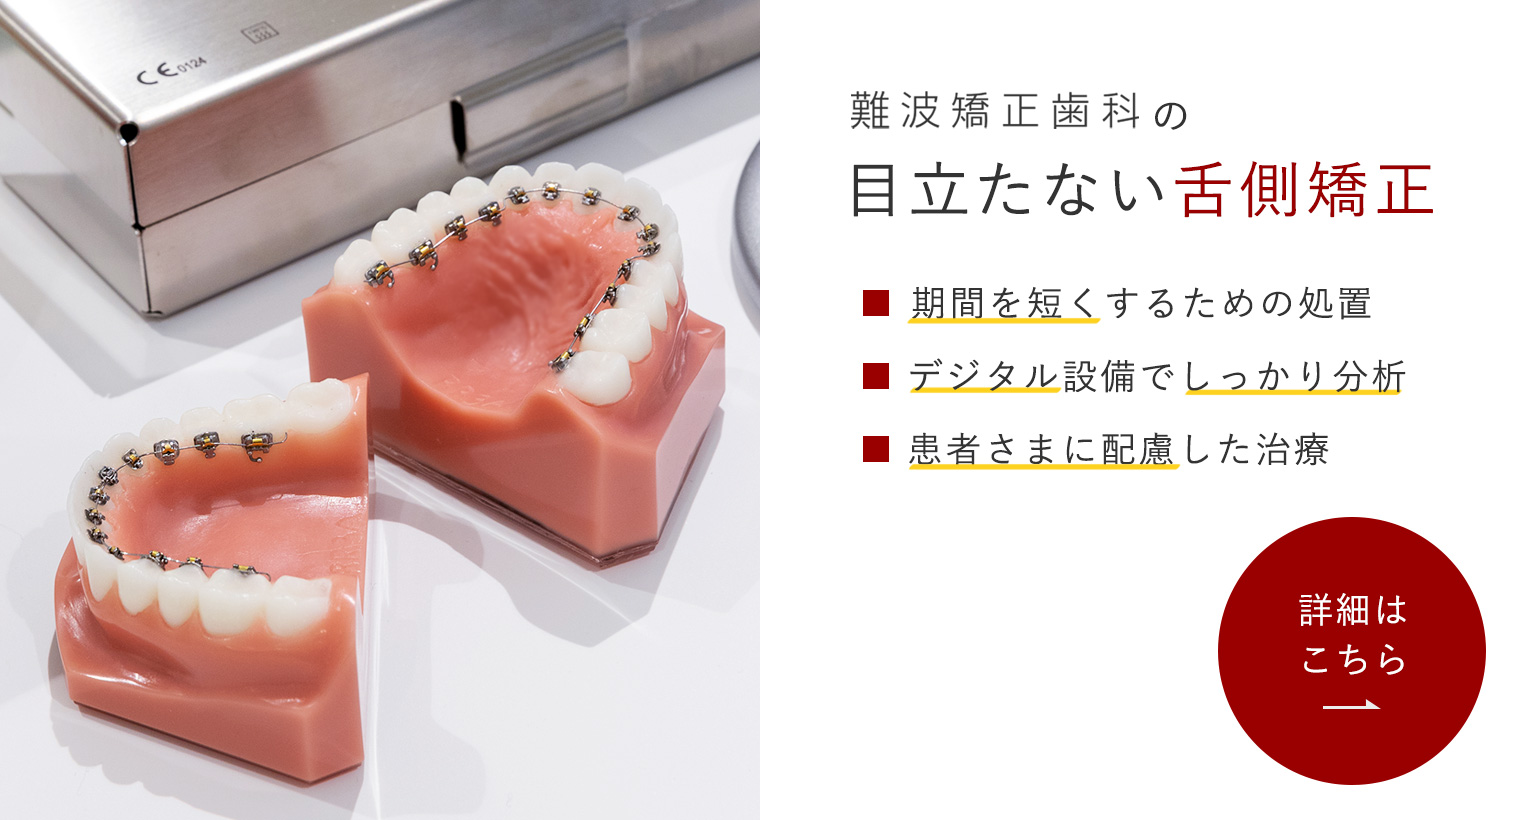 難波矯正歯科 日本矯正歯科学会専門医監修 裏側につく舌側矯正